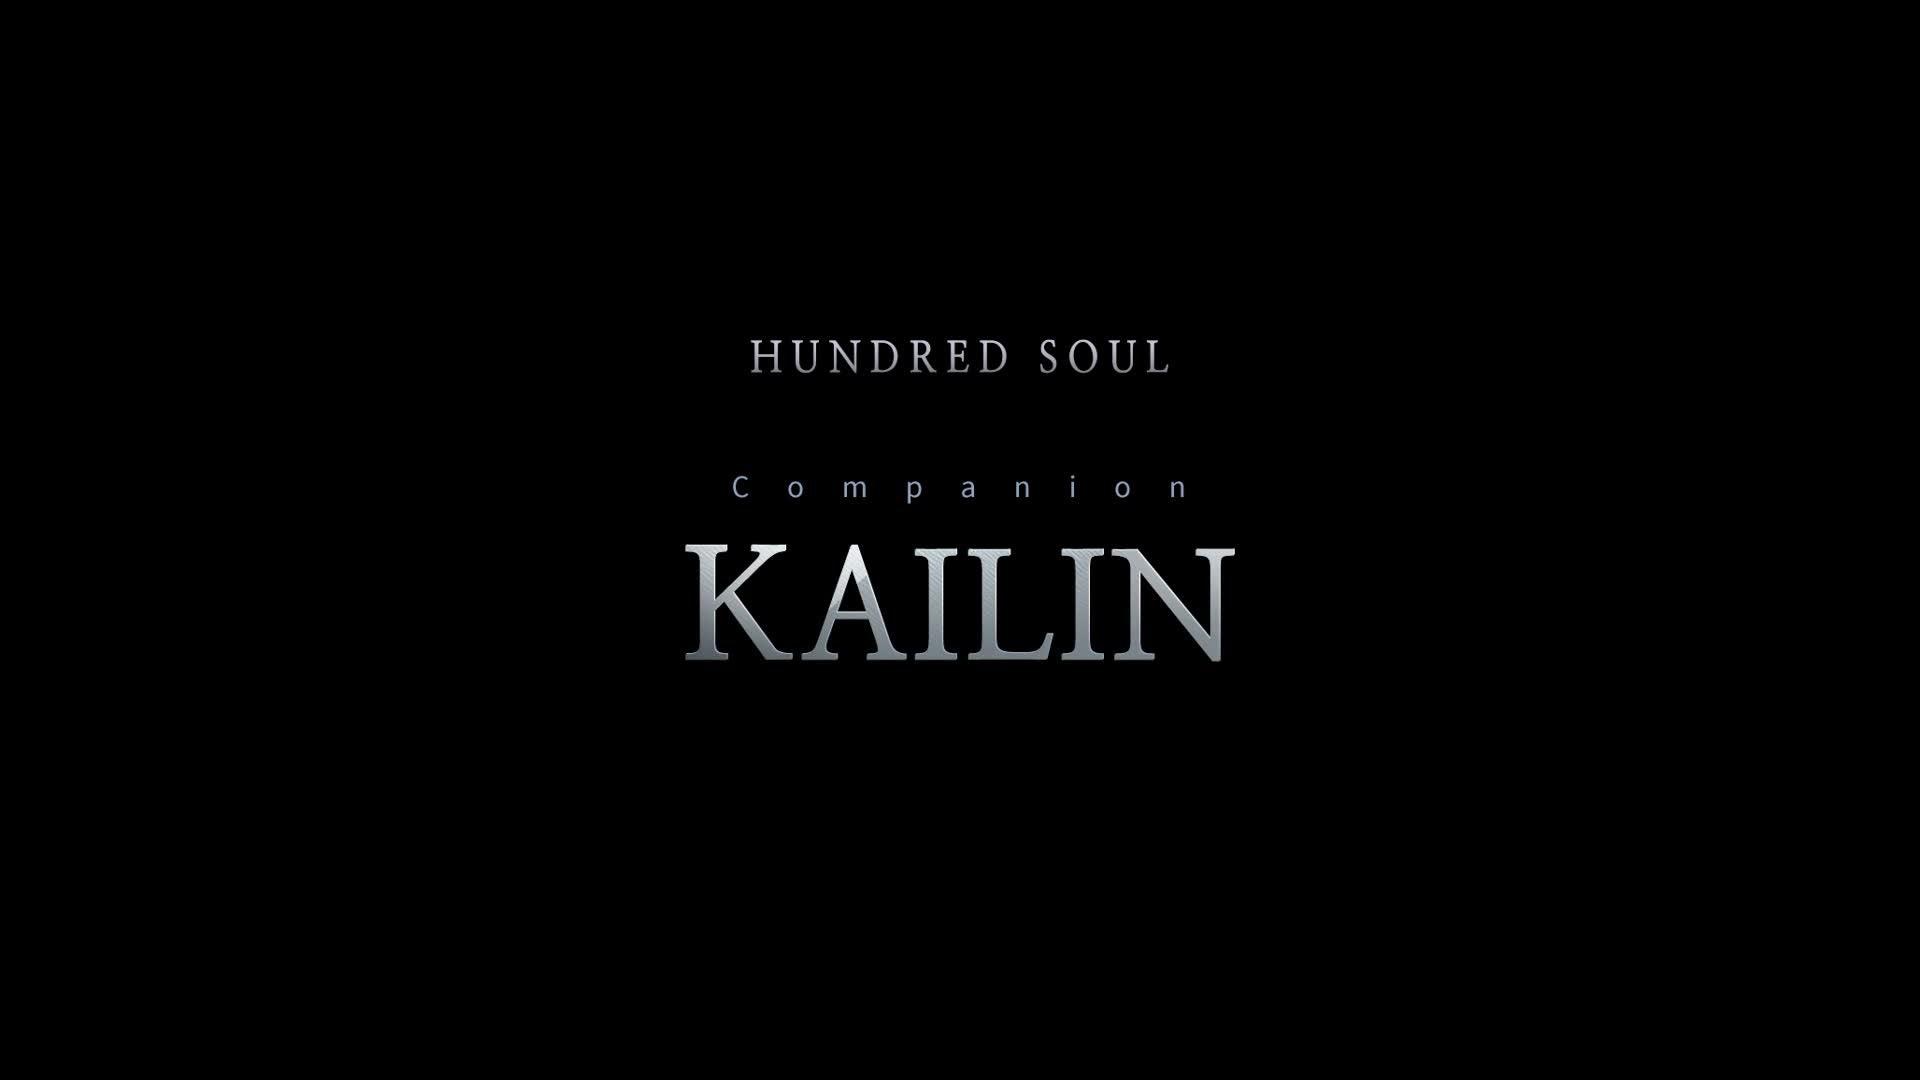 Hundred Soul (TWN): 活動 - 強勢回歸 –【祀奉女神的神殿騎士】 卡伊琳 video cover image 0